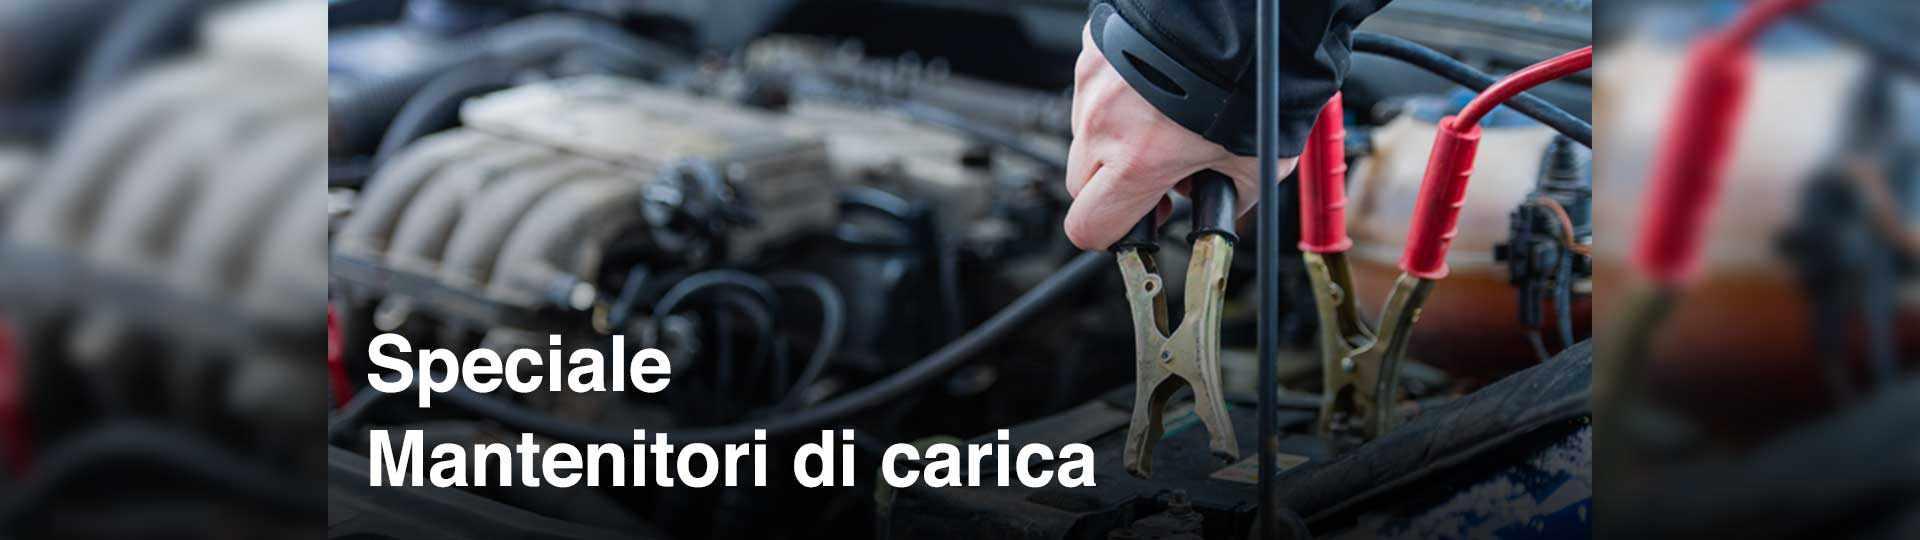 header_mantenitori_carica.jpg